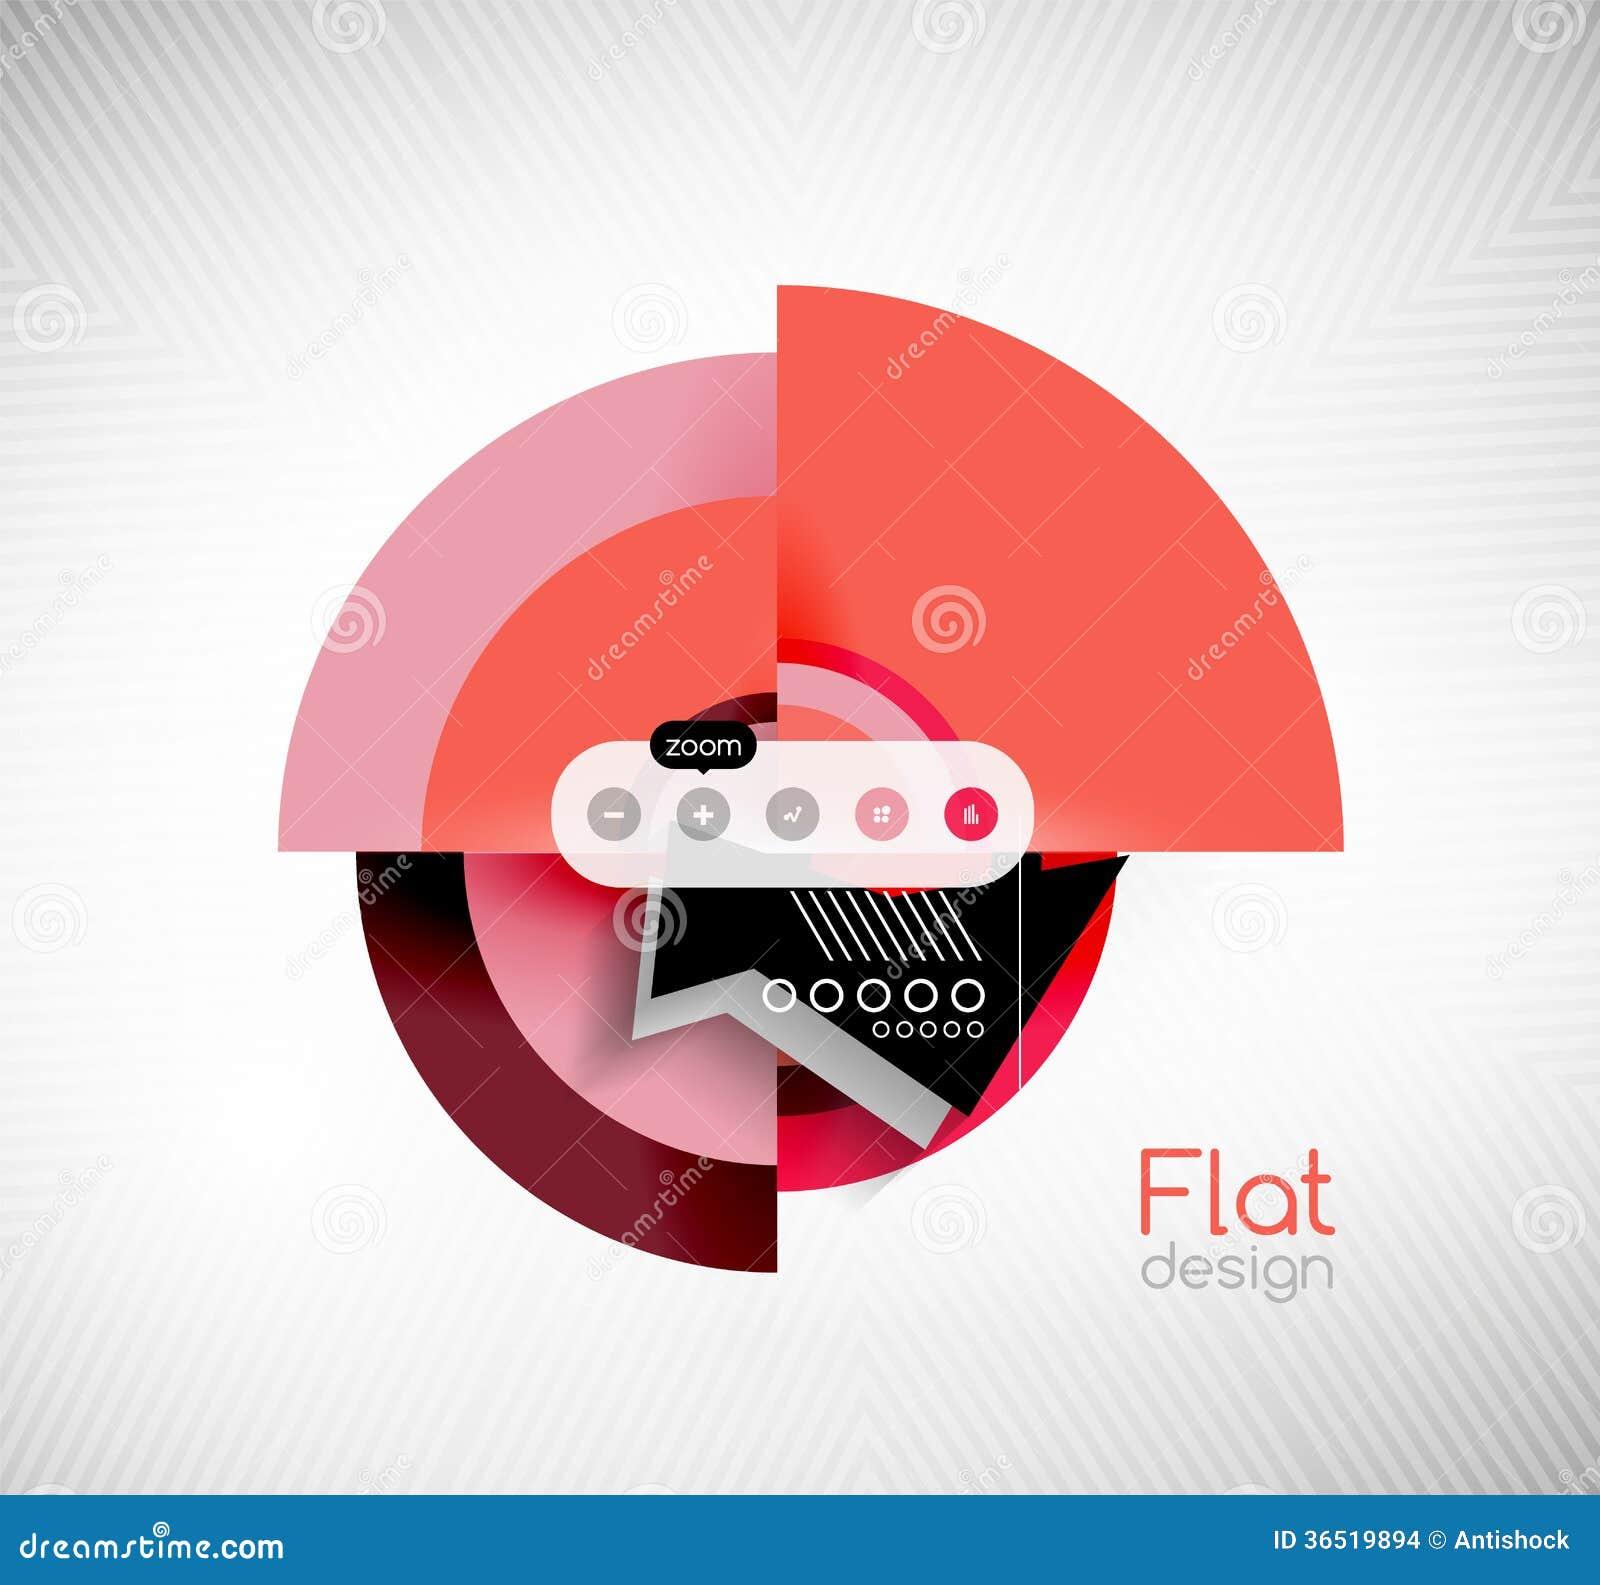 Circle geometric shapes flat interface design